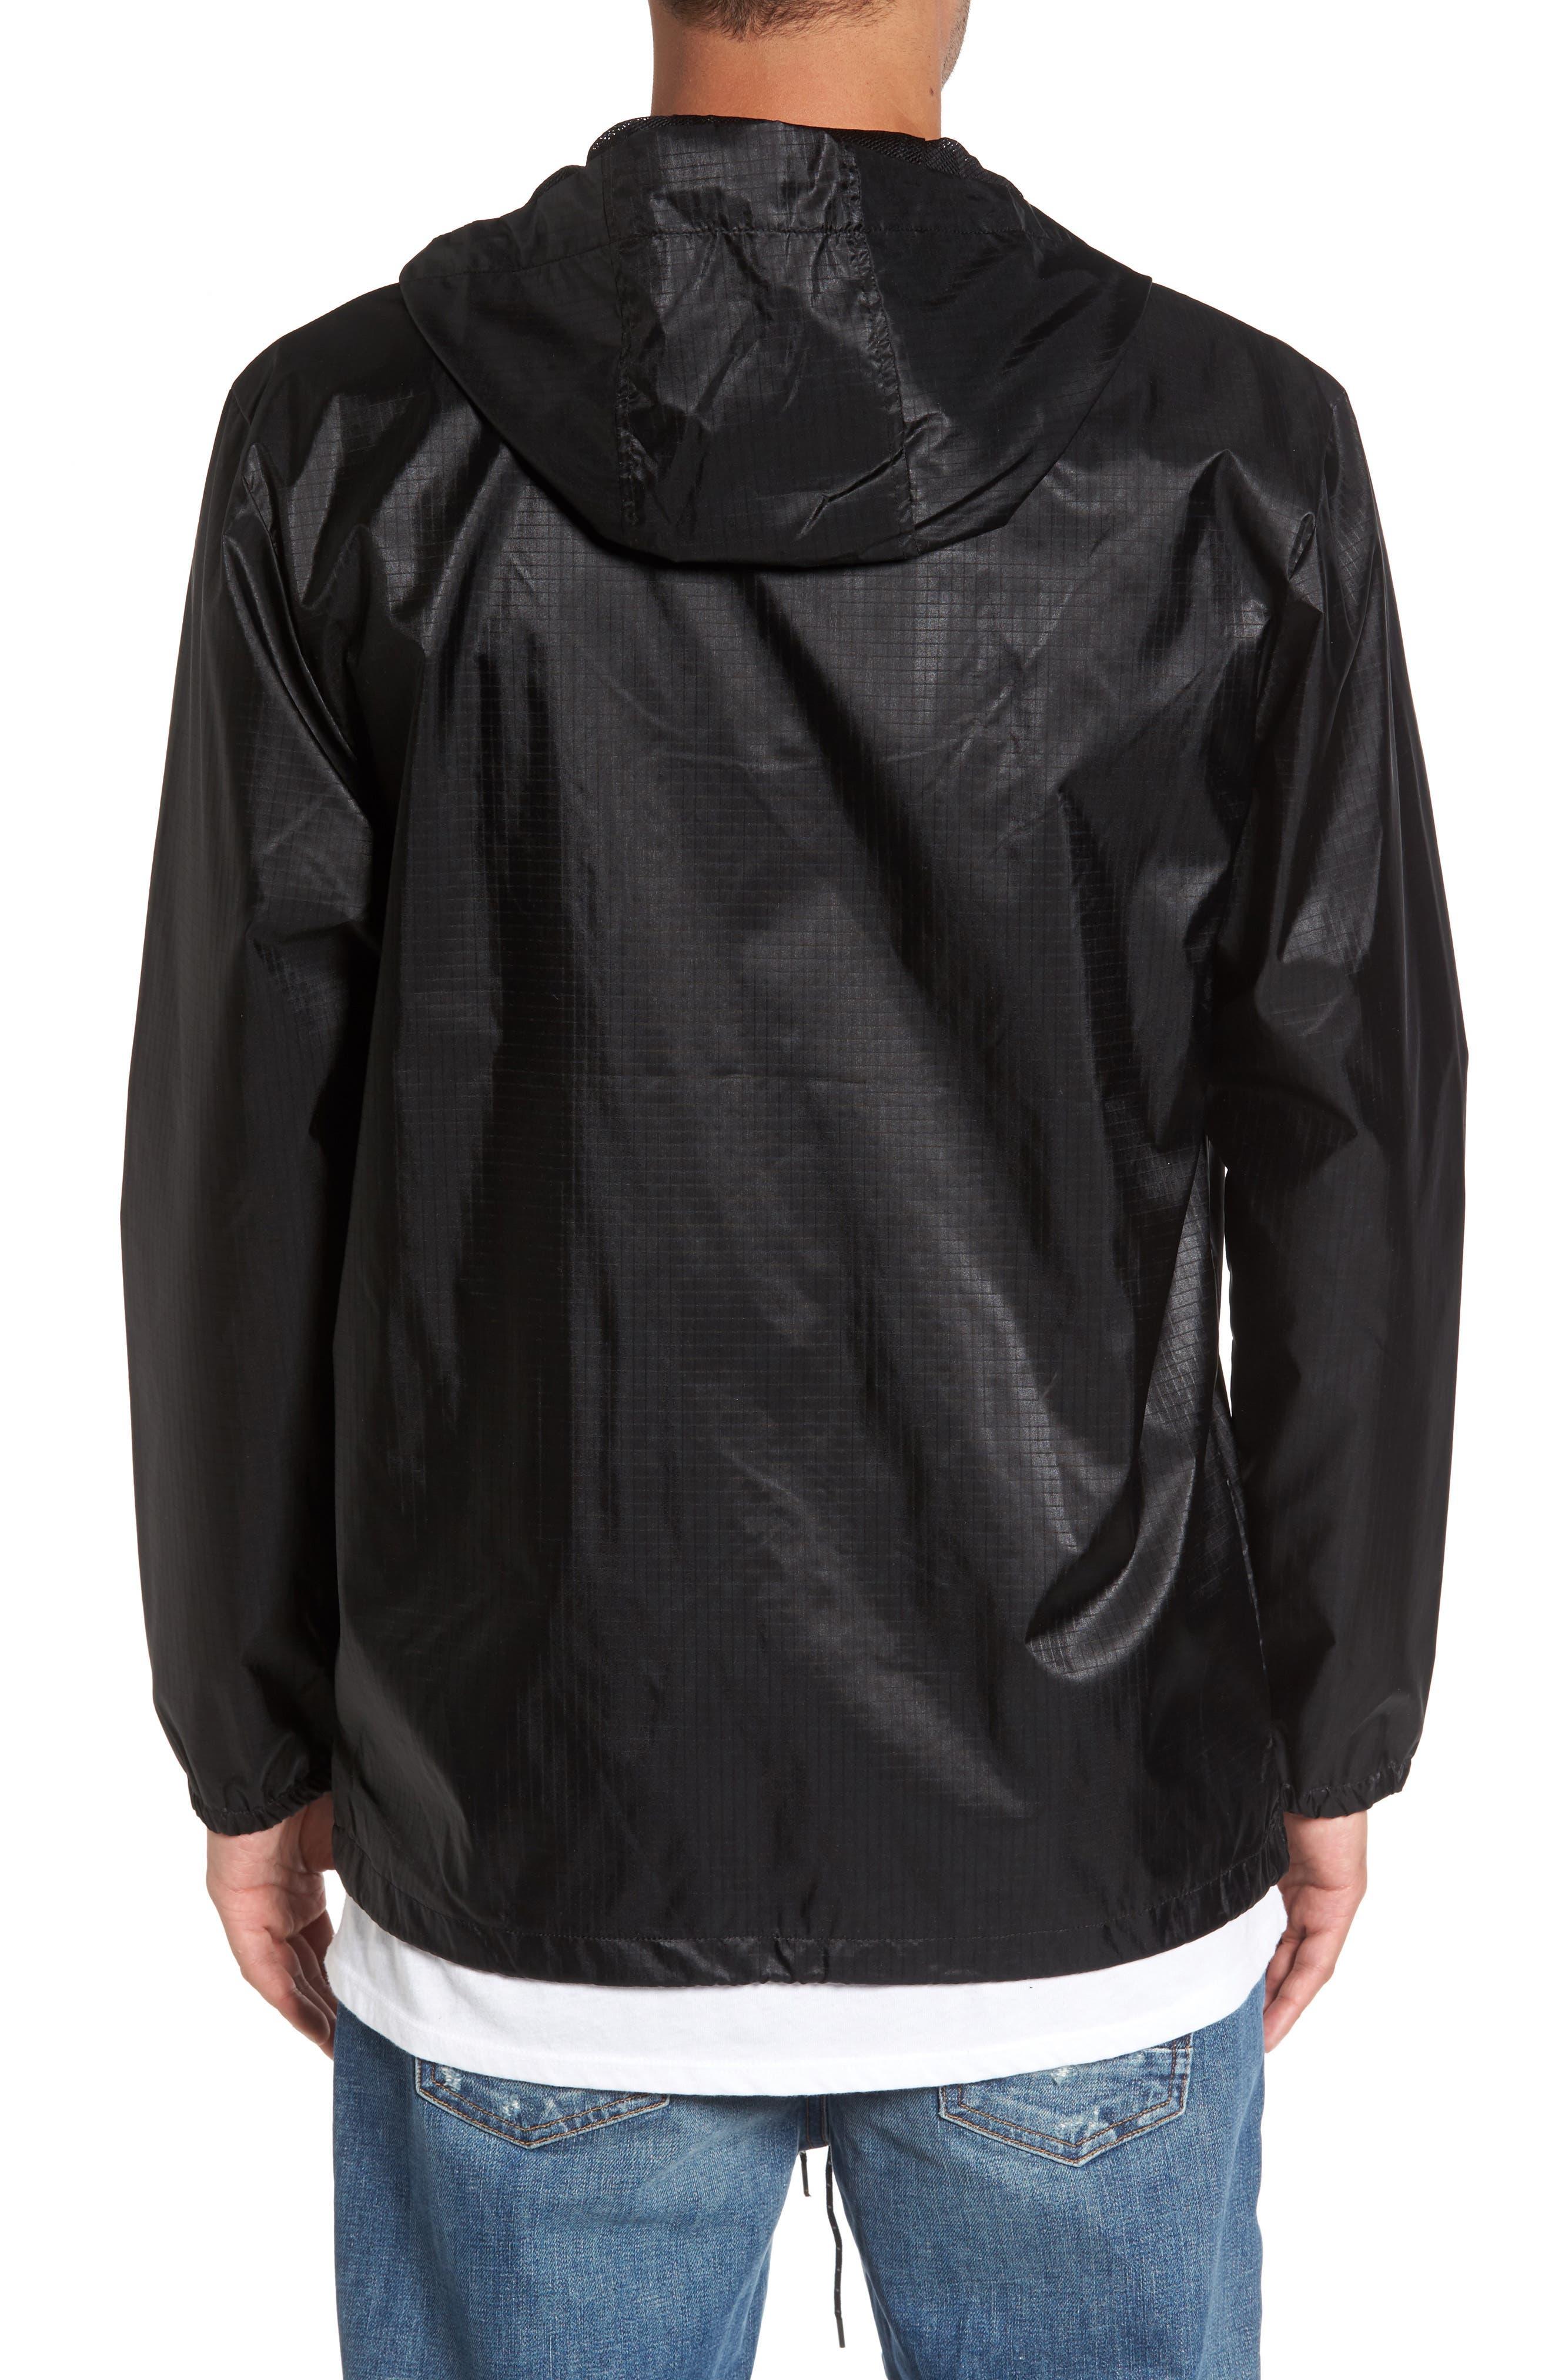 NCT Vulcan Coach's Jacket,                             Alternate thumbnail 5, color,